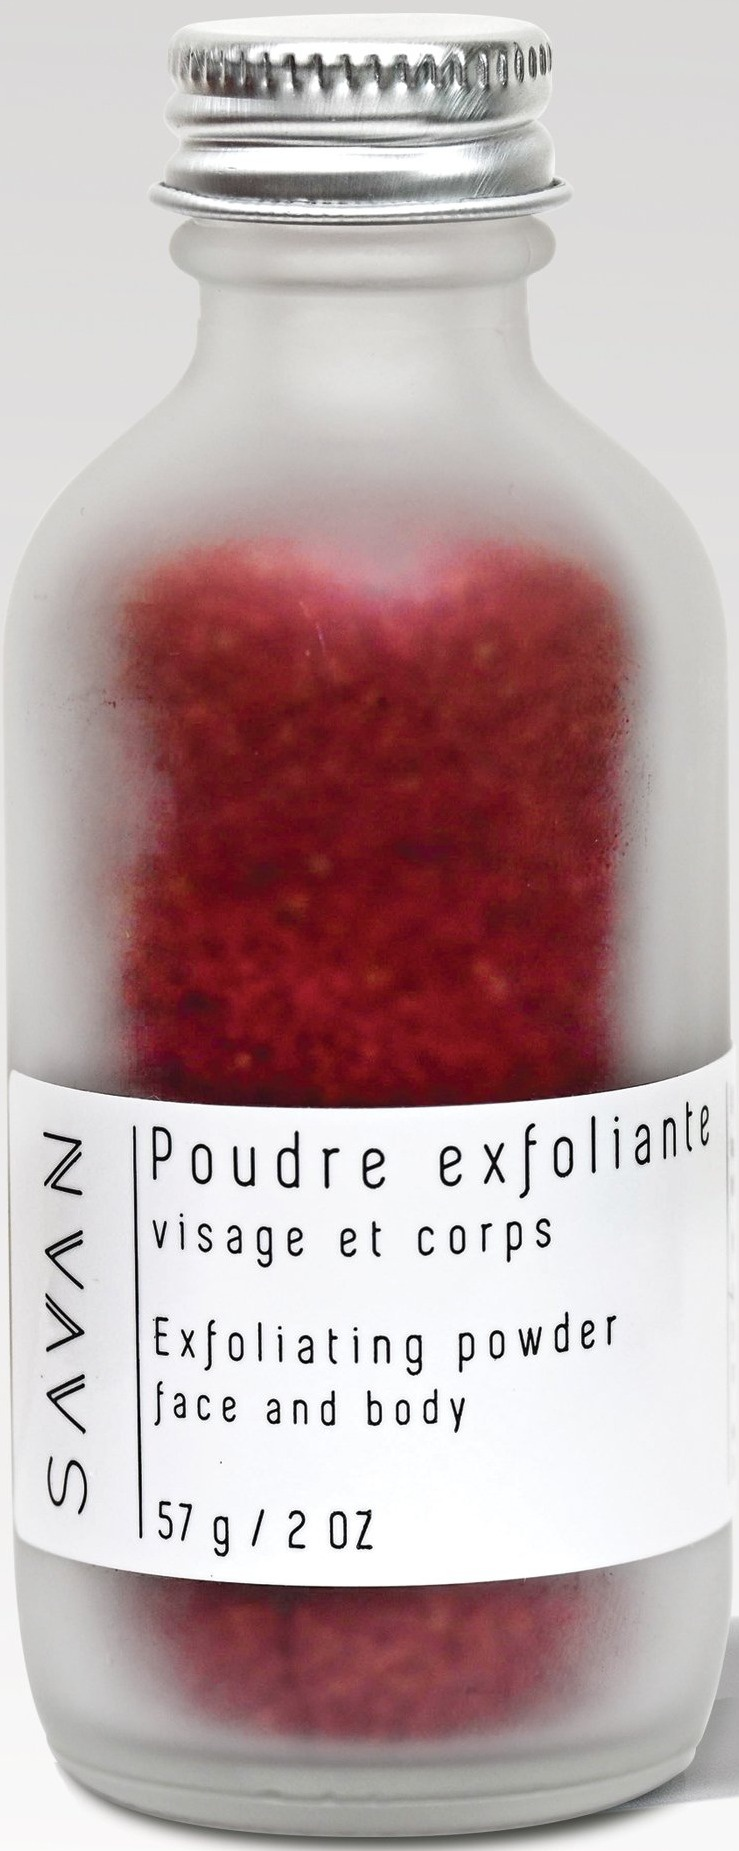 Savan Skincare Exfoliating Powder